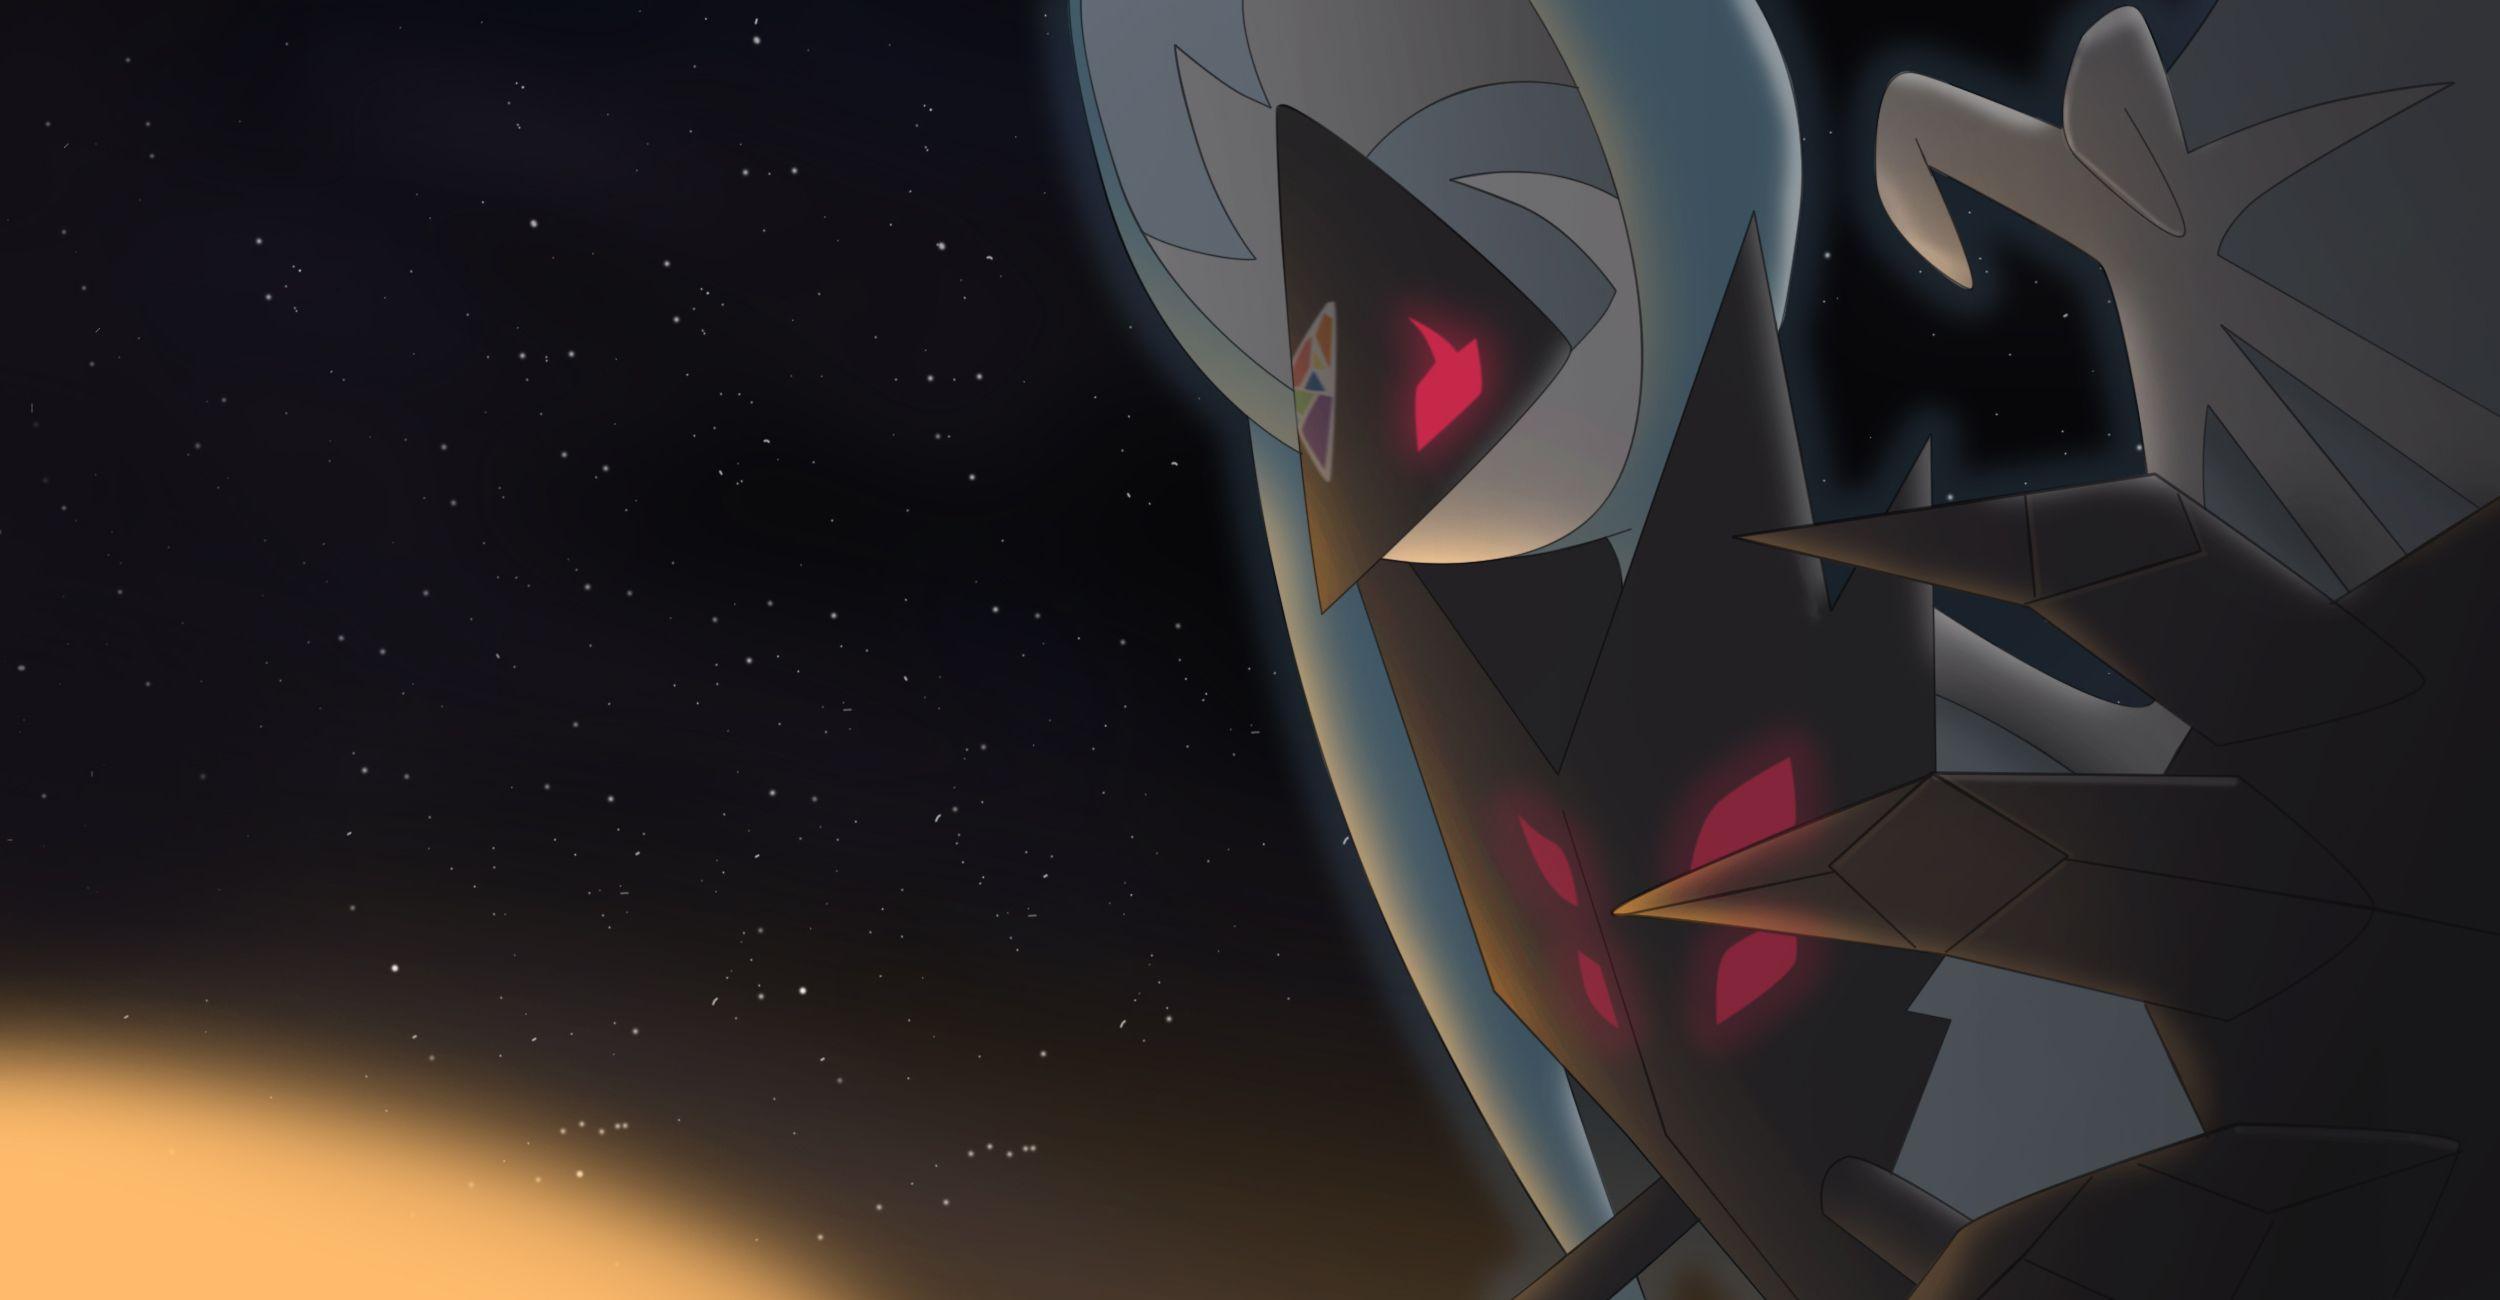 Pokemon Ultra Sun And Ultra Moon Wallpapers Top Free Pokemon